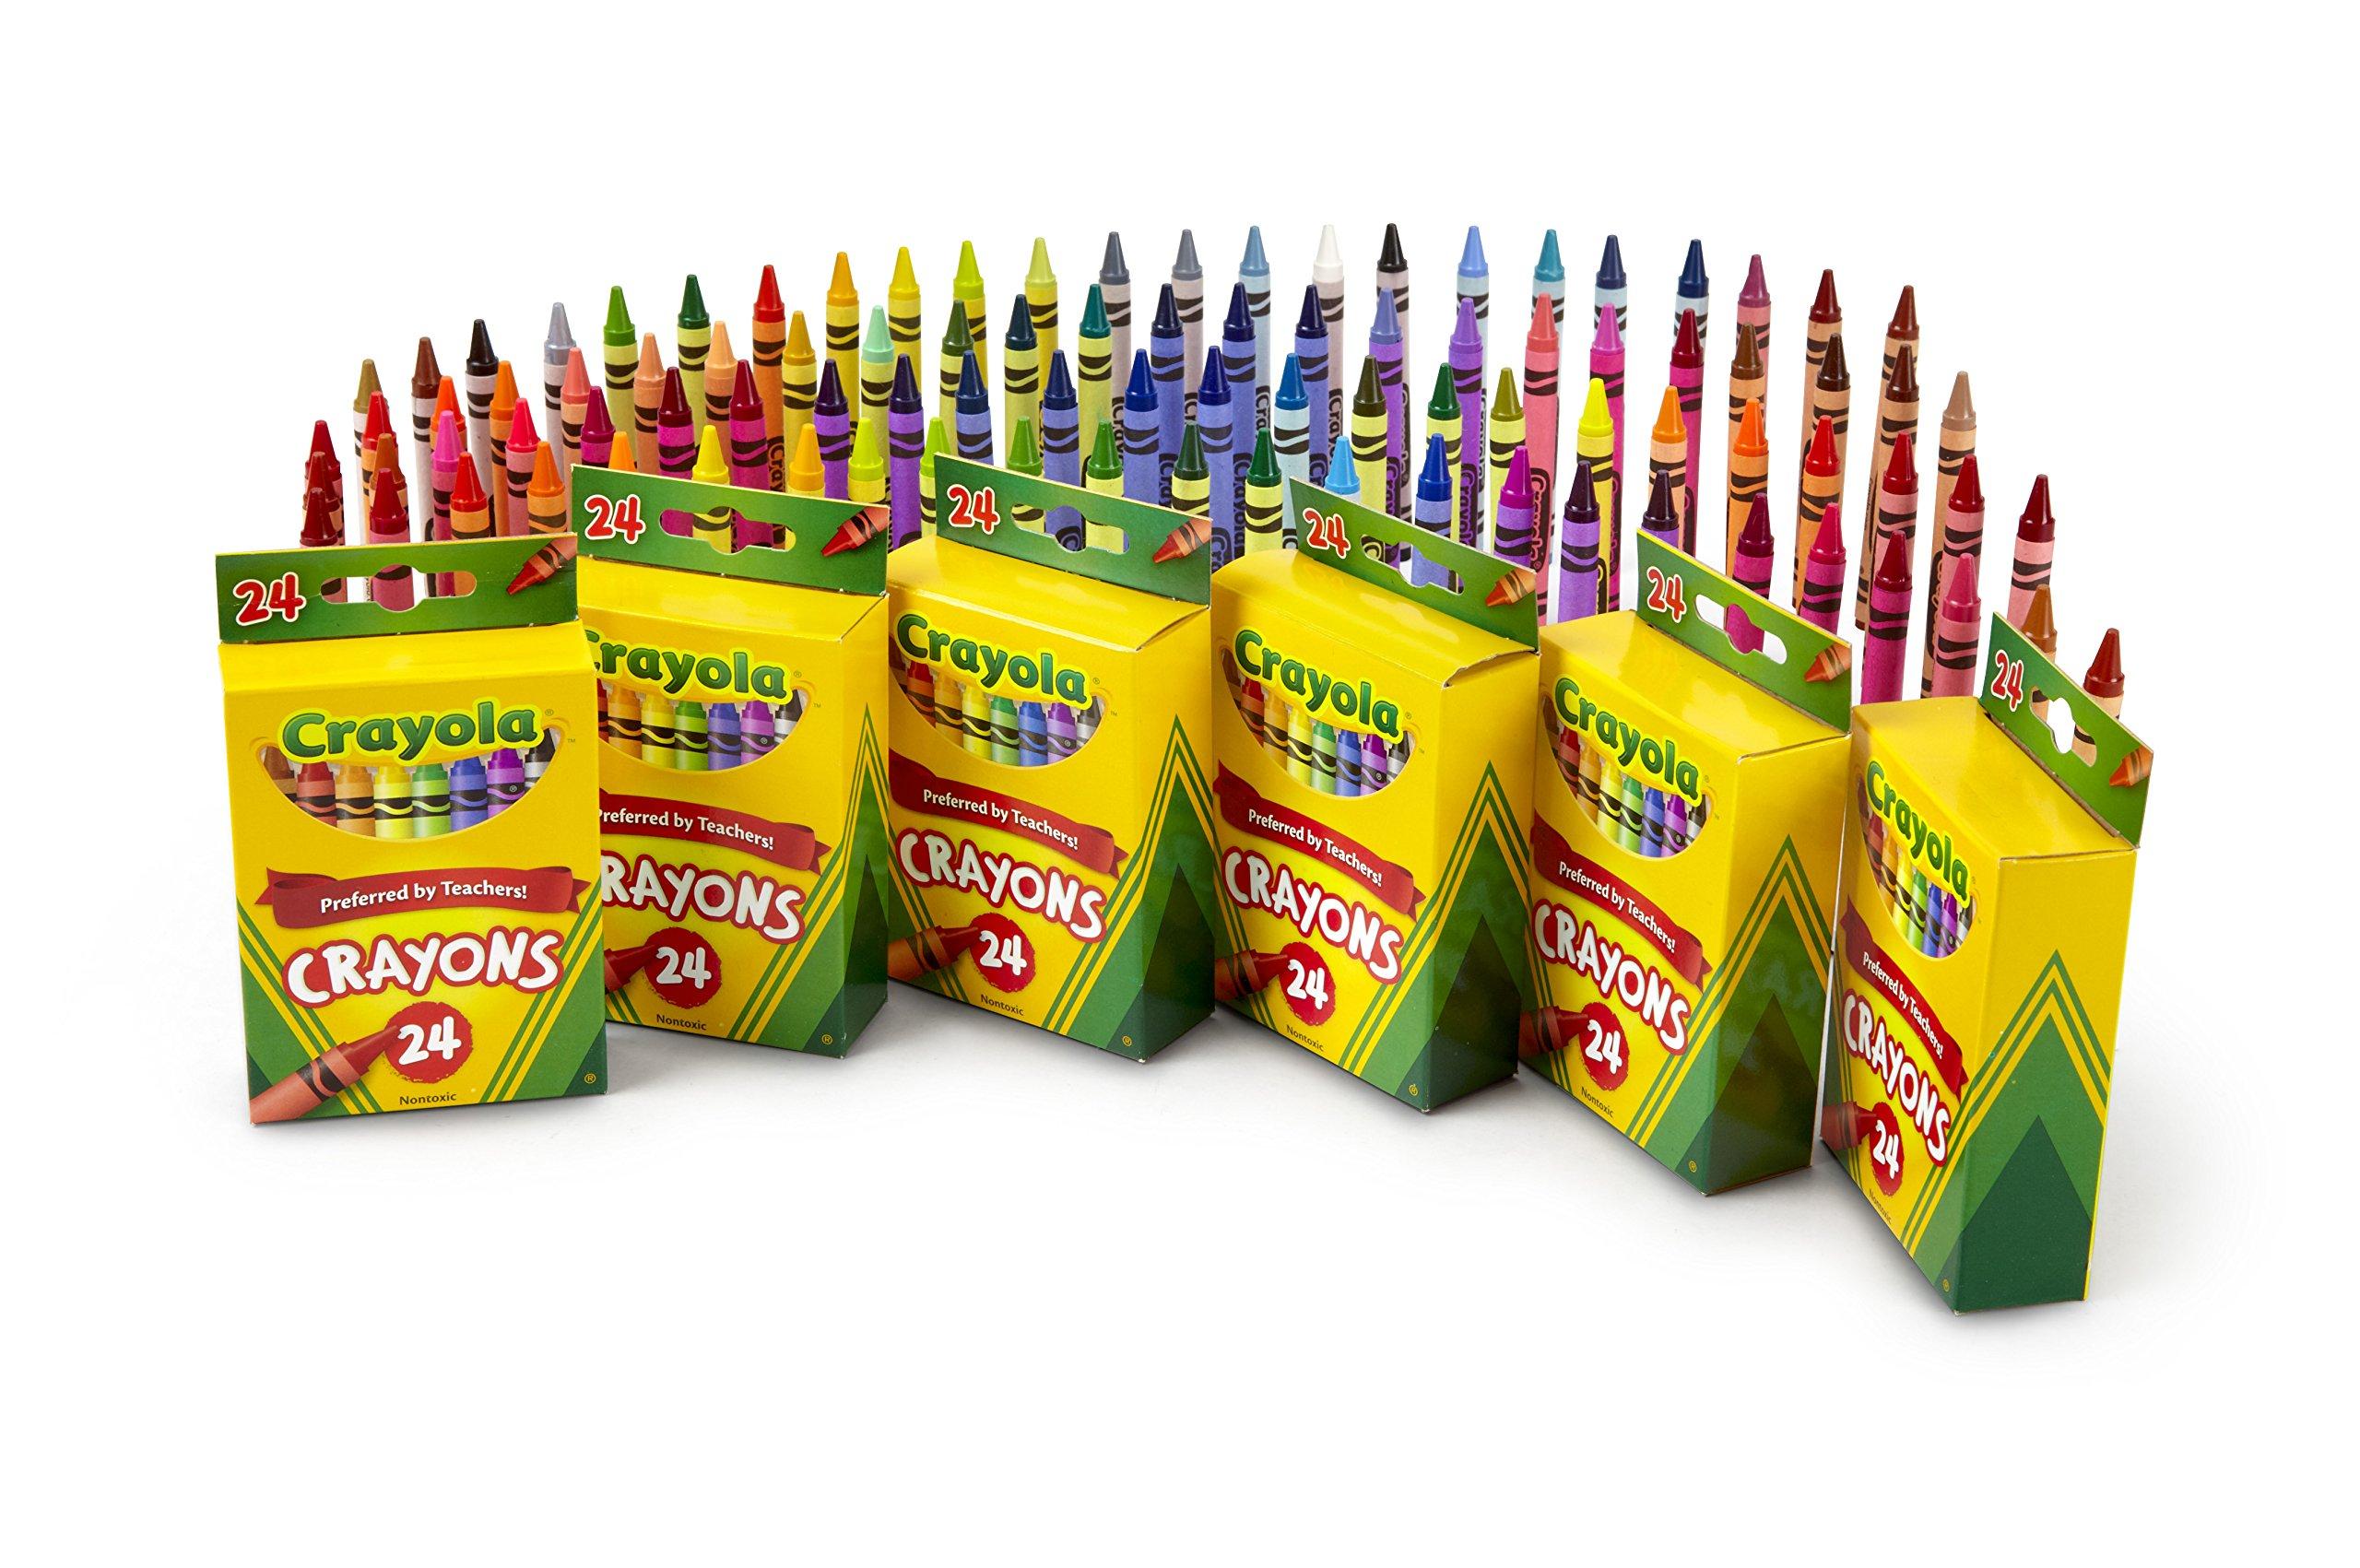 Crayola Crayons, School & Art Supplies, Bulk 6 Pack of 24Count by Crayola